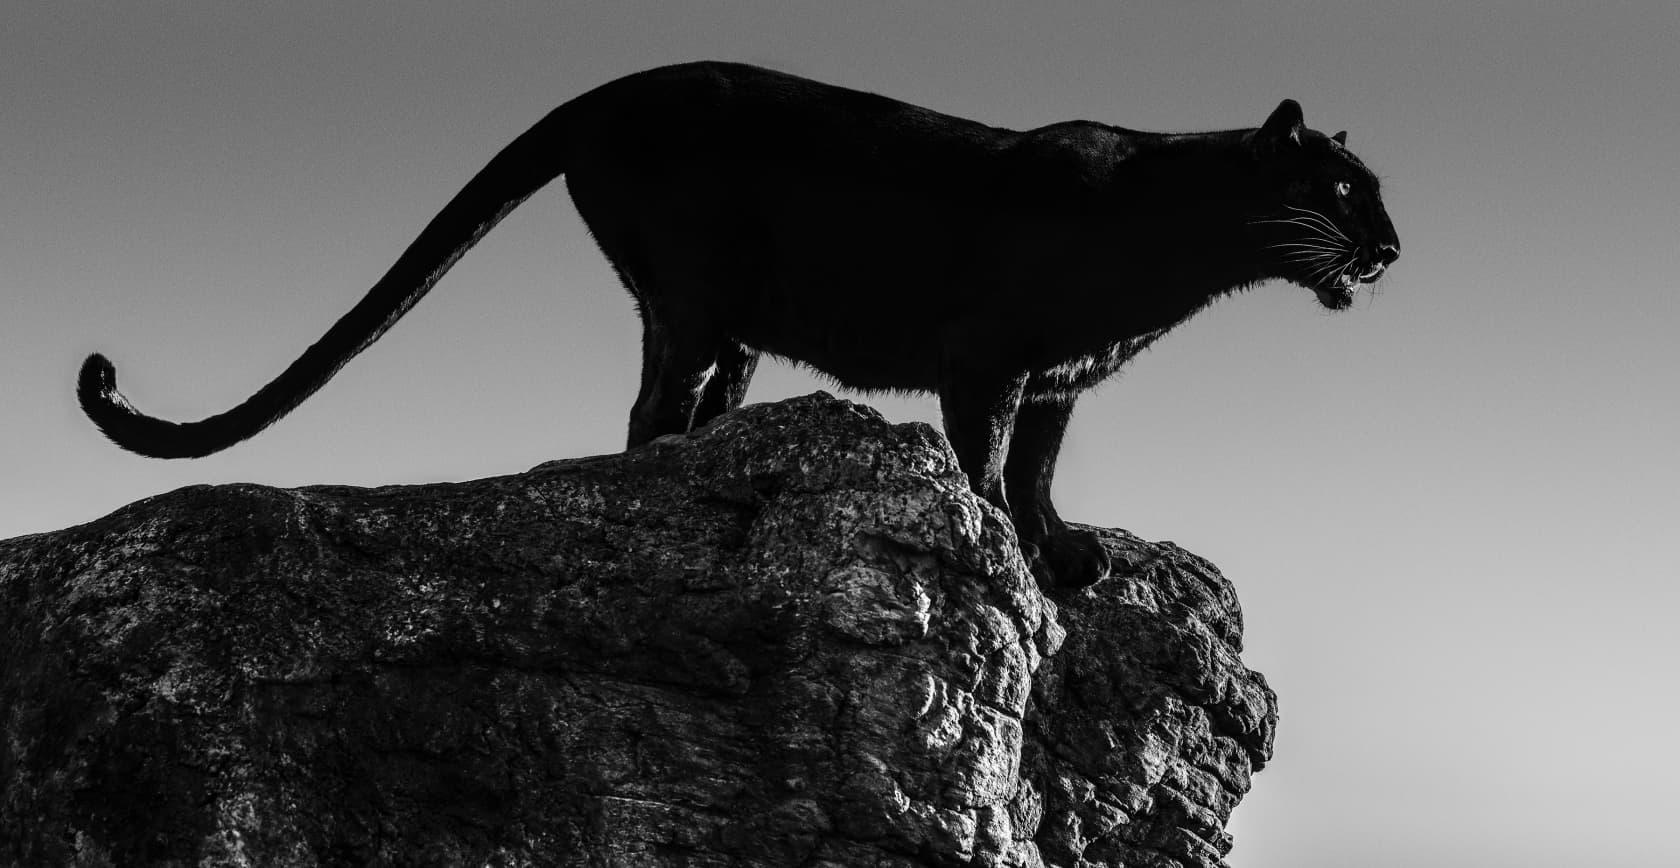 David Yarrow, Black Cat, 2019